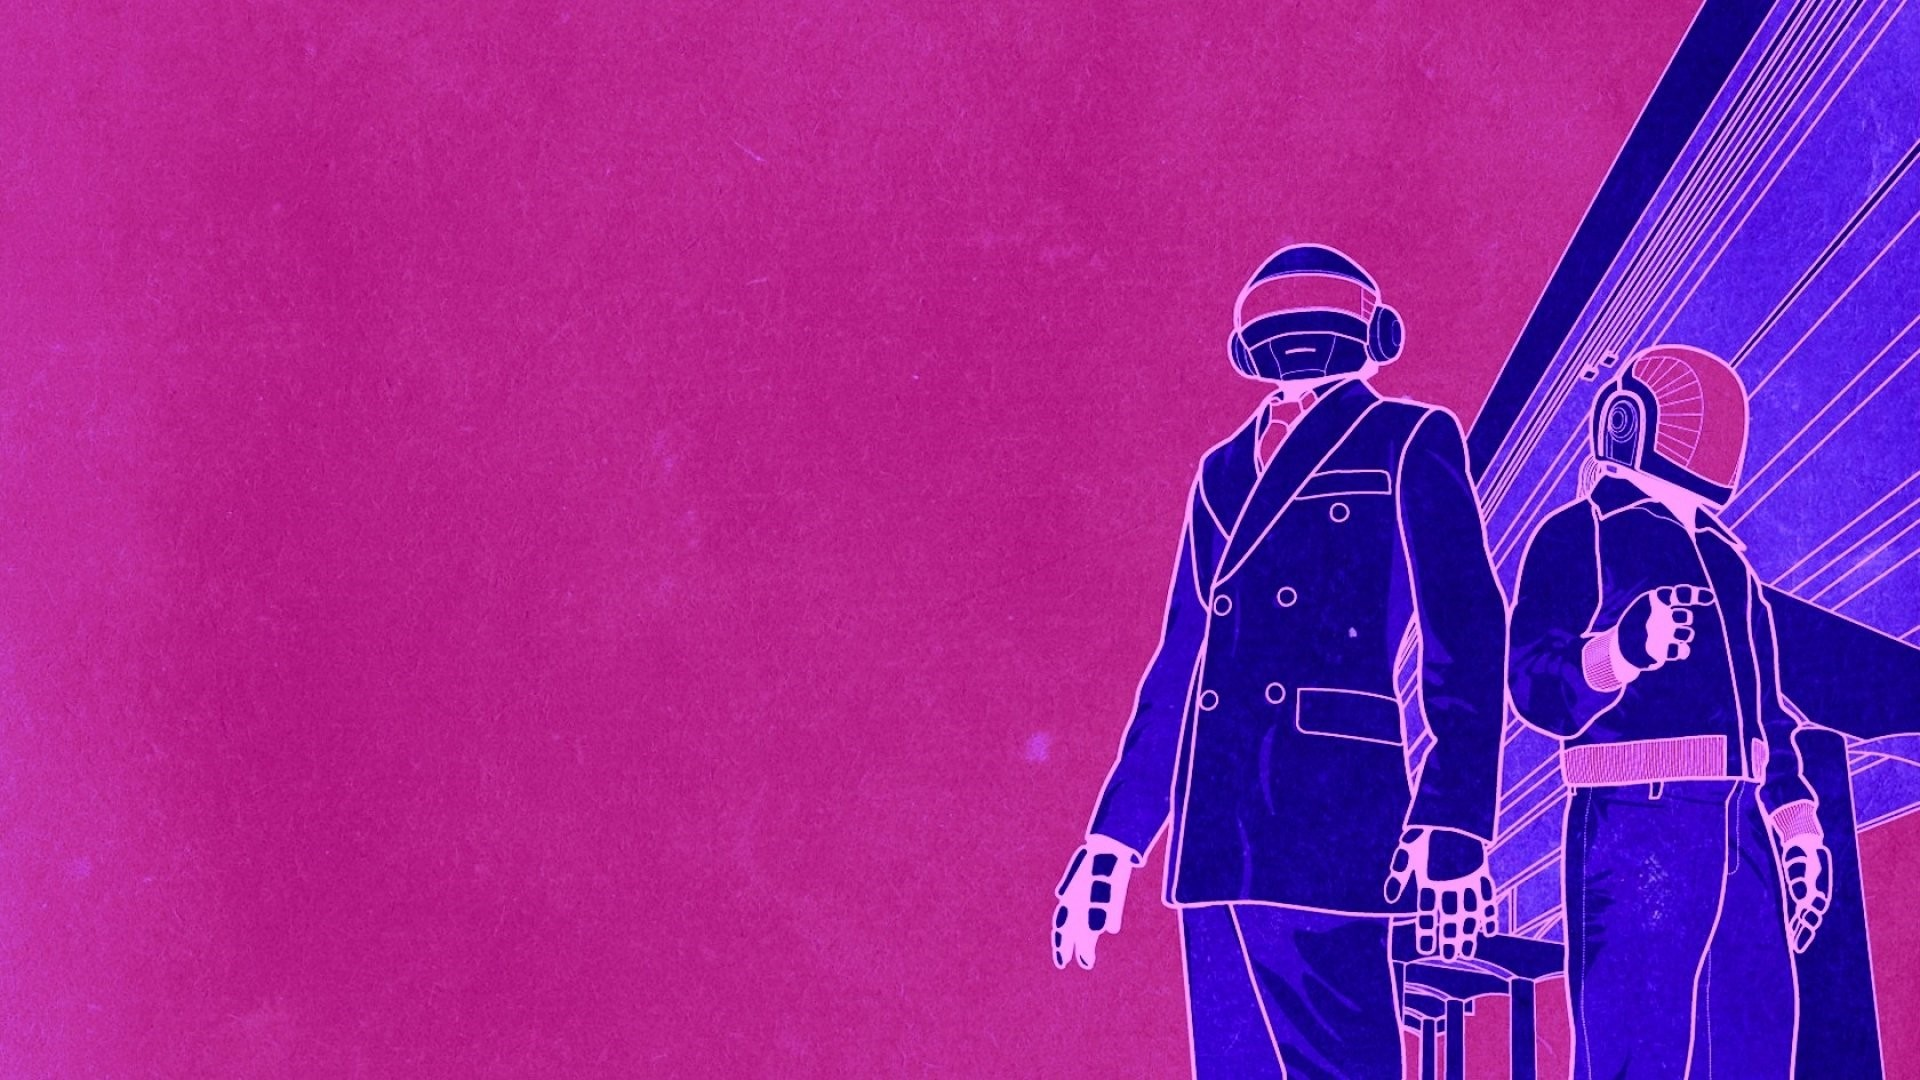 Daft Punk Download Wallpaper